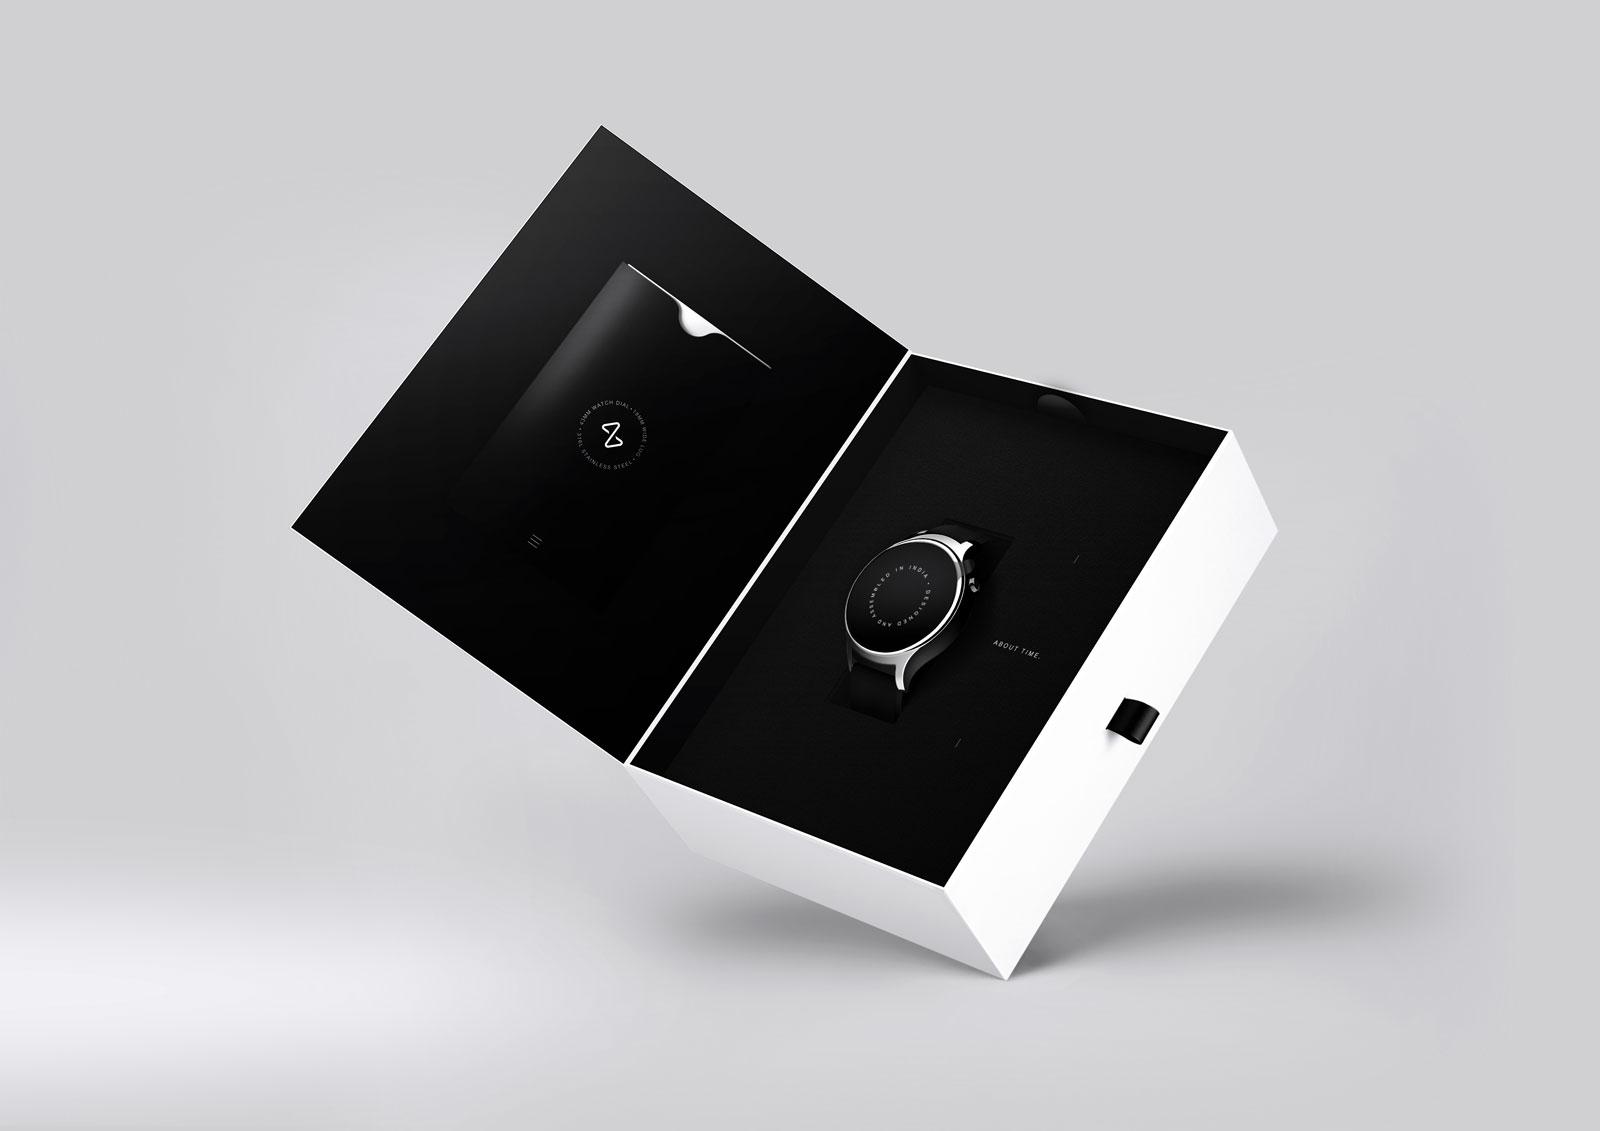 blink-watch-09.jpg